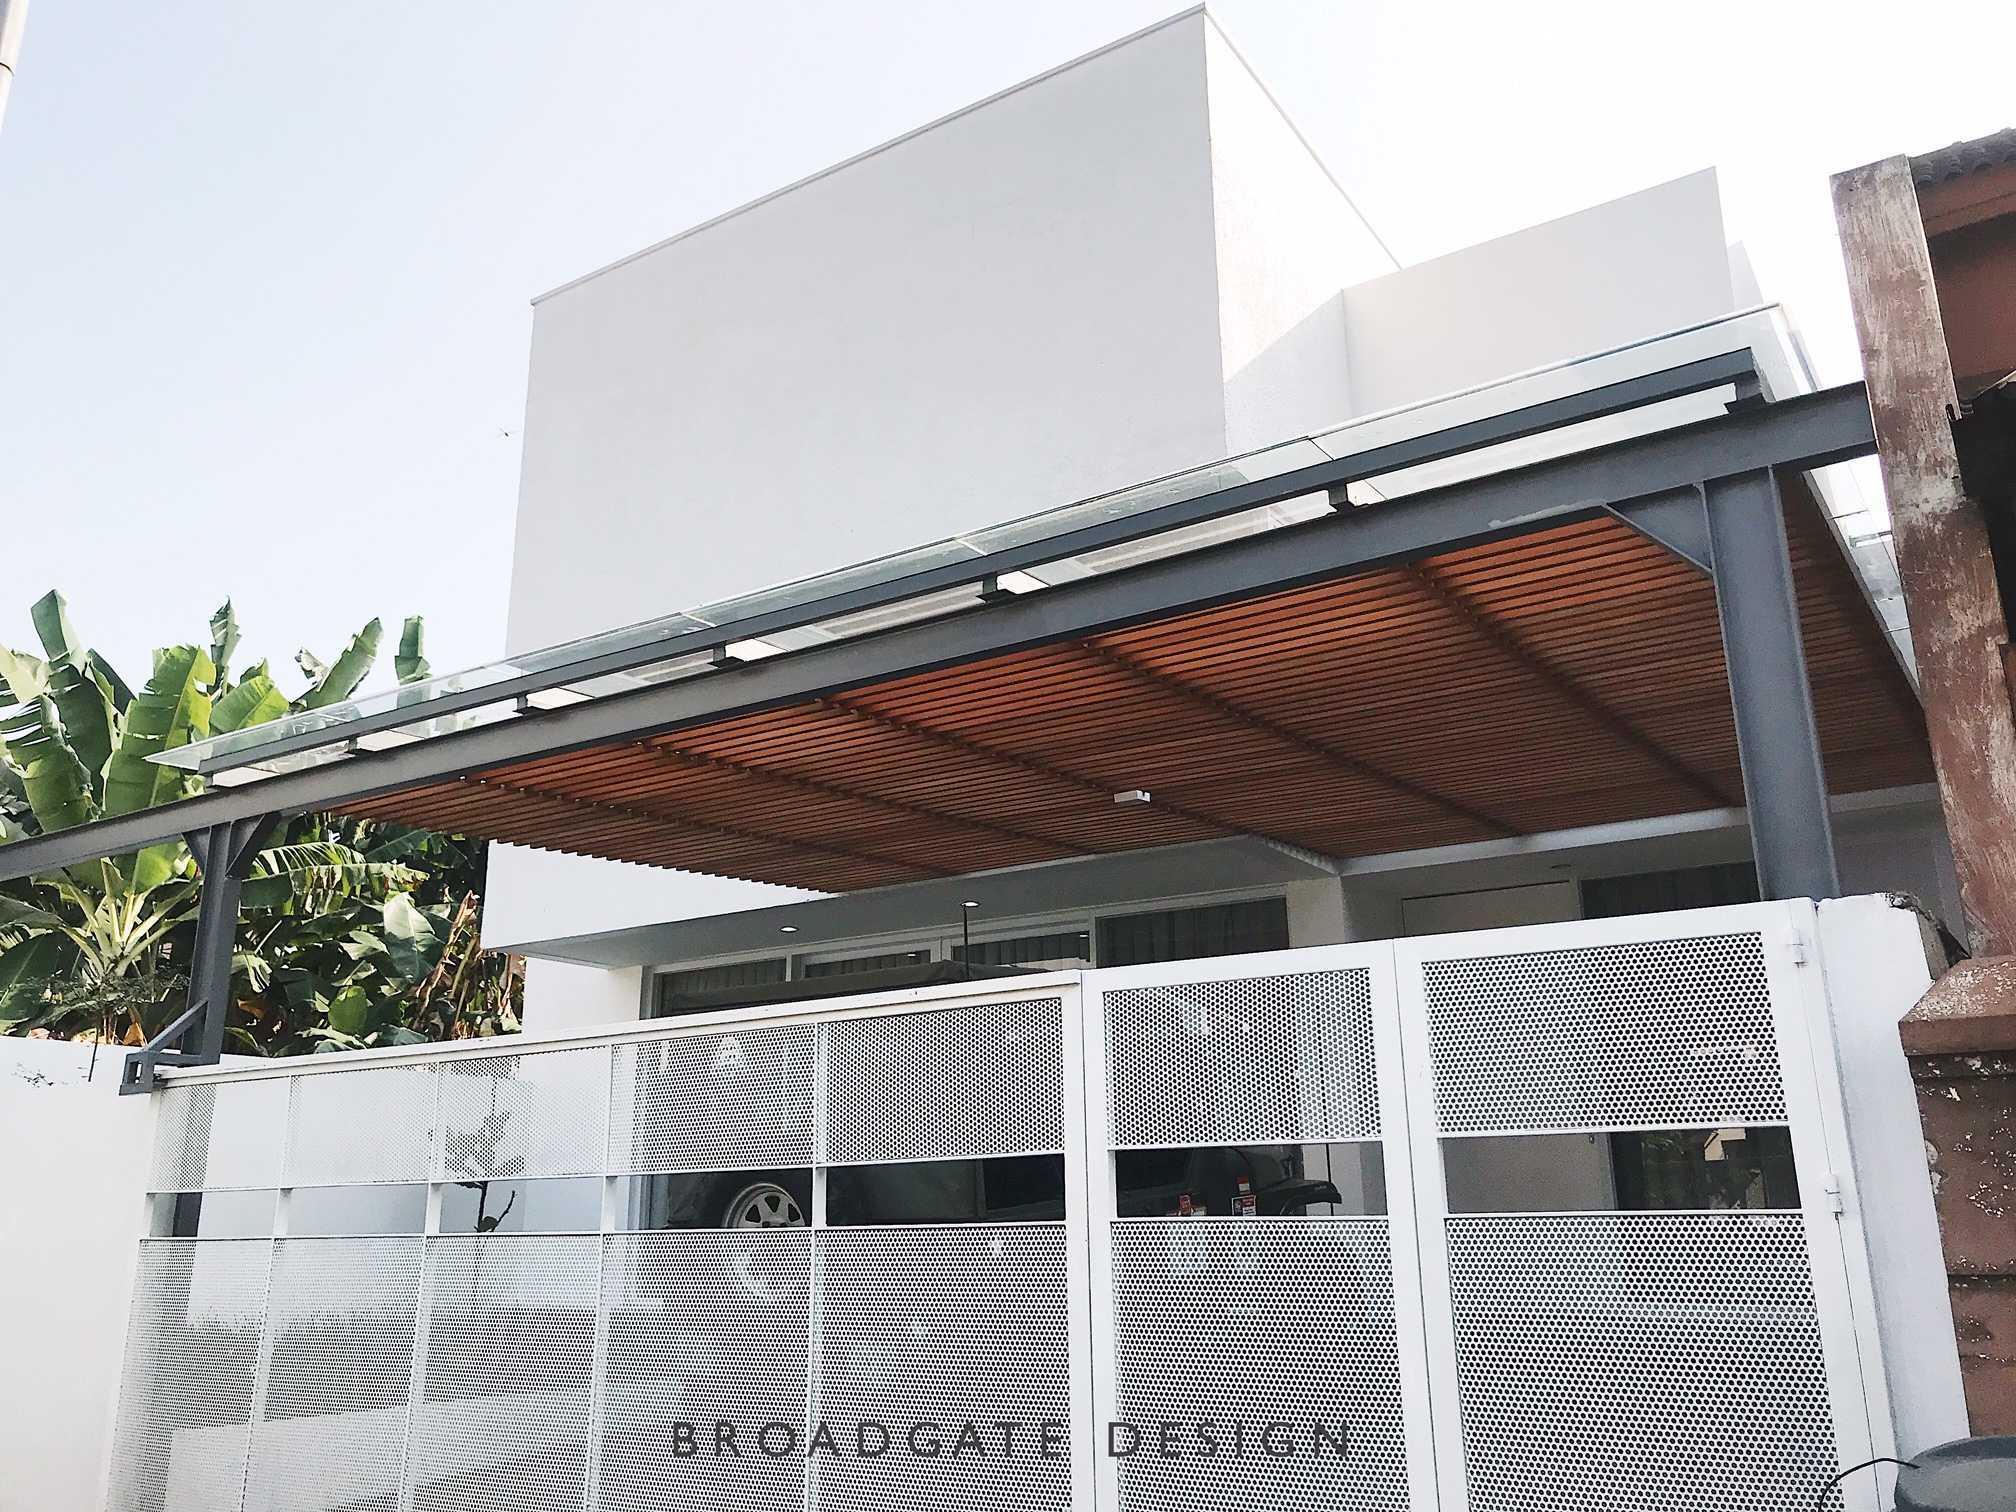 Broadgate Iv House Lippo Karawaci, Binong, Kec. Curug, Tangerang, Banten, Indonesia Lippo Karawaci, Binong, Kec. Curug, Tangerang, Banten, Indonesia Broadgate-Iv-House  74173